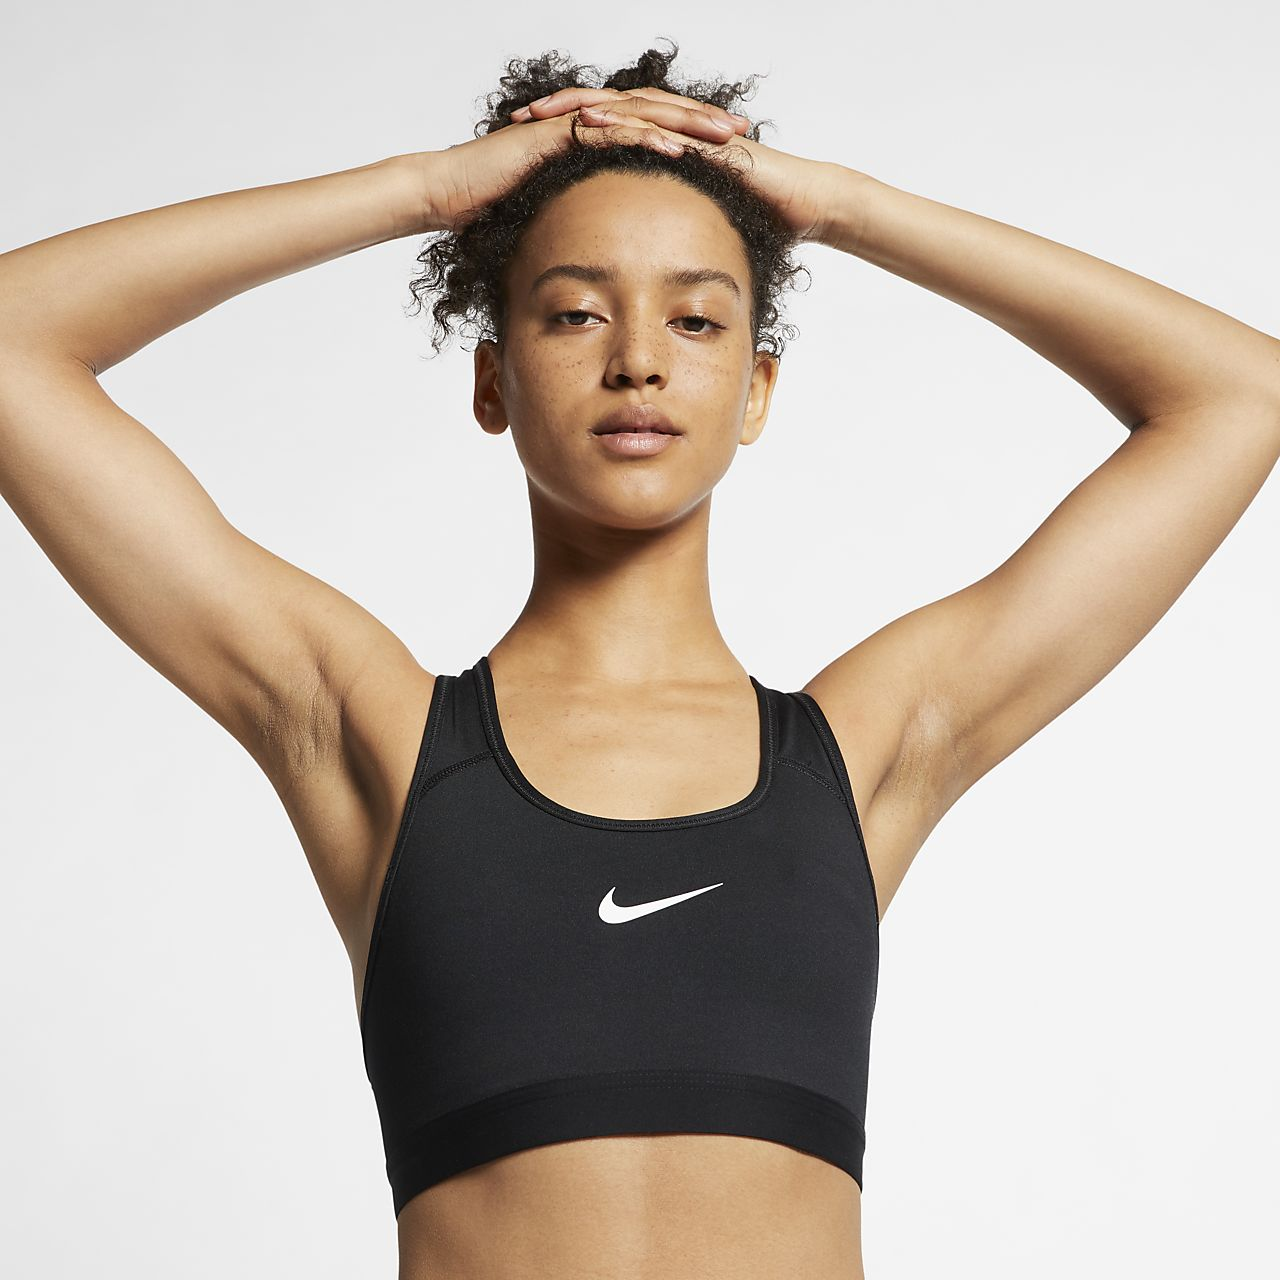 78f52ee98f89f Nike Classic Padded Women s Medium-Support Sports Bra. Nike.com AU